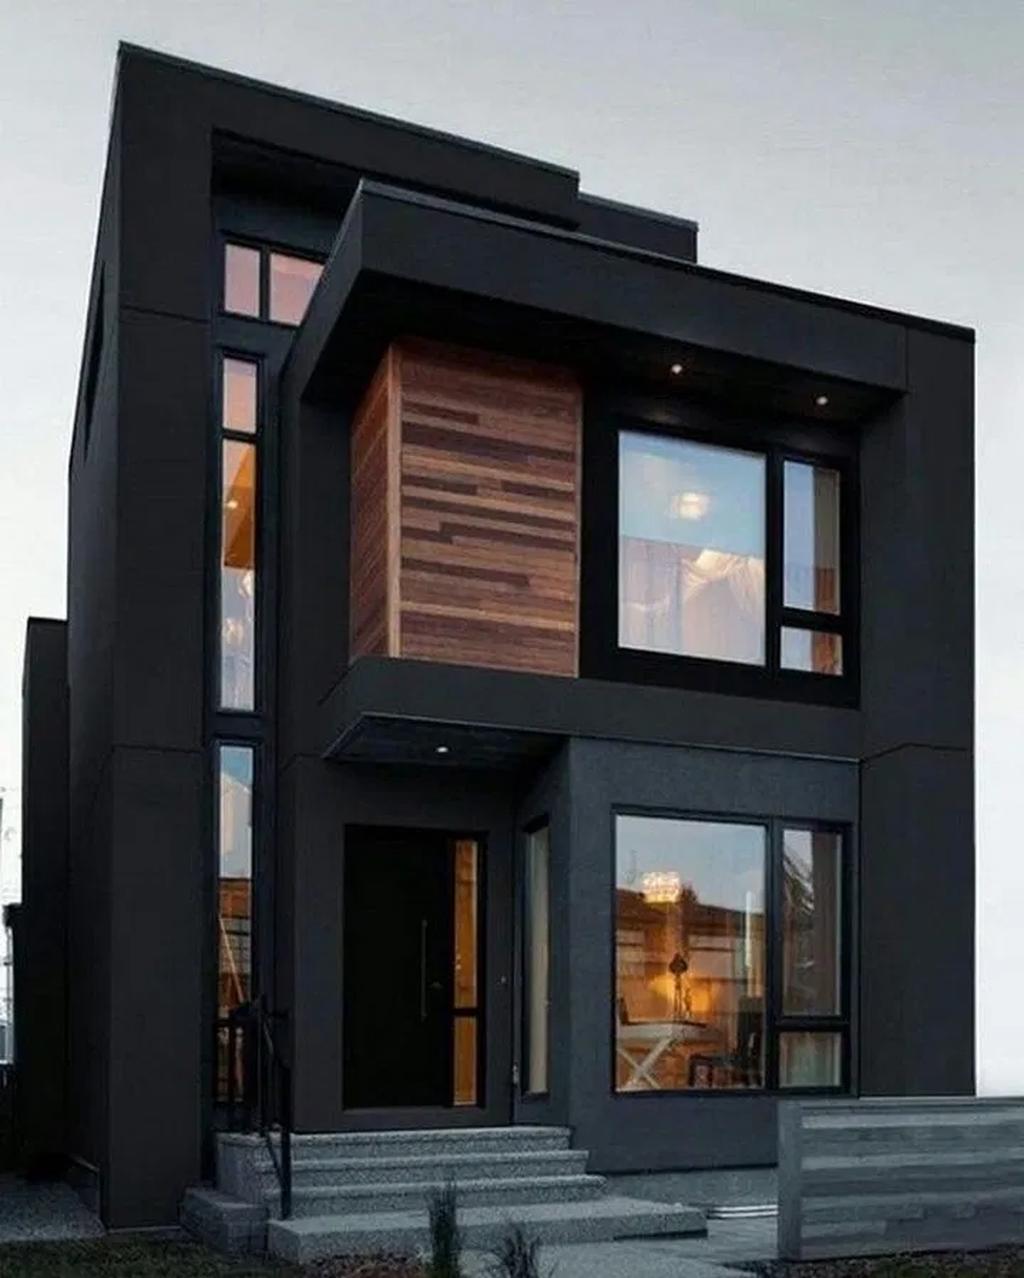 33 Inspiring Modern Minimalist House Design Ideas Best Modern House Design Modern Minimalist House Modern Architecture Building